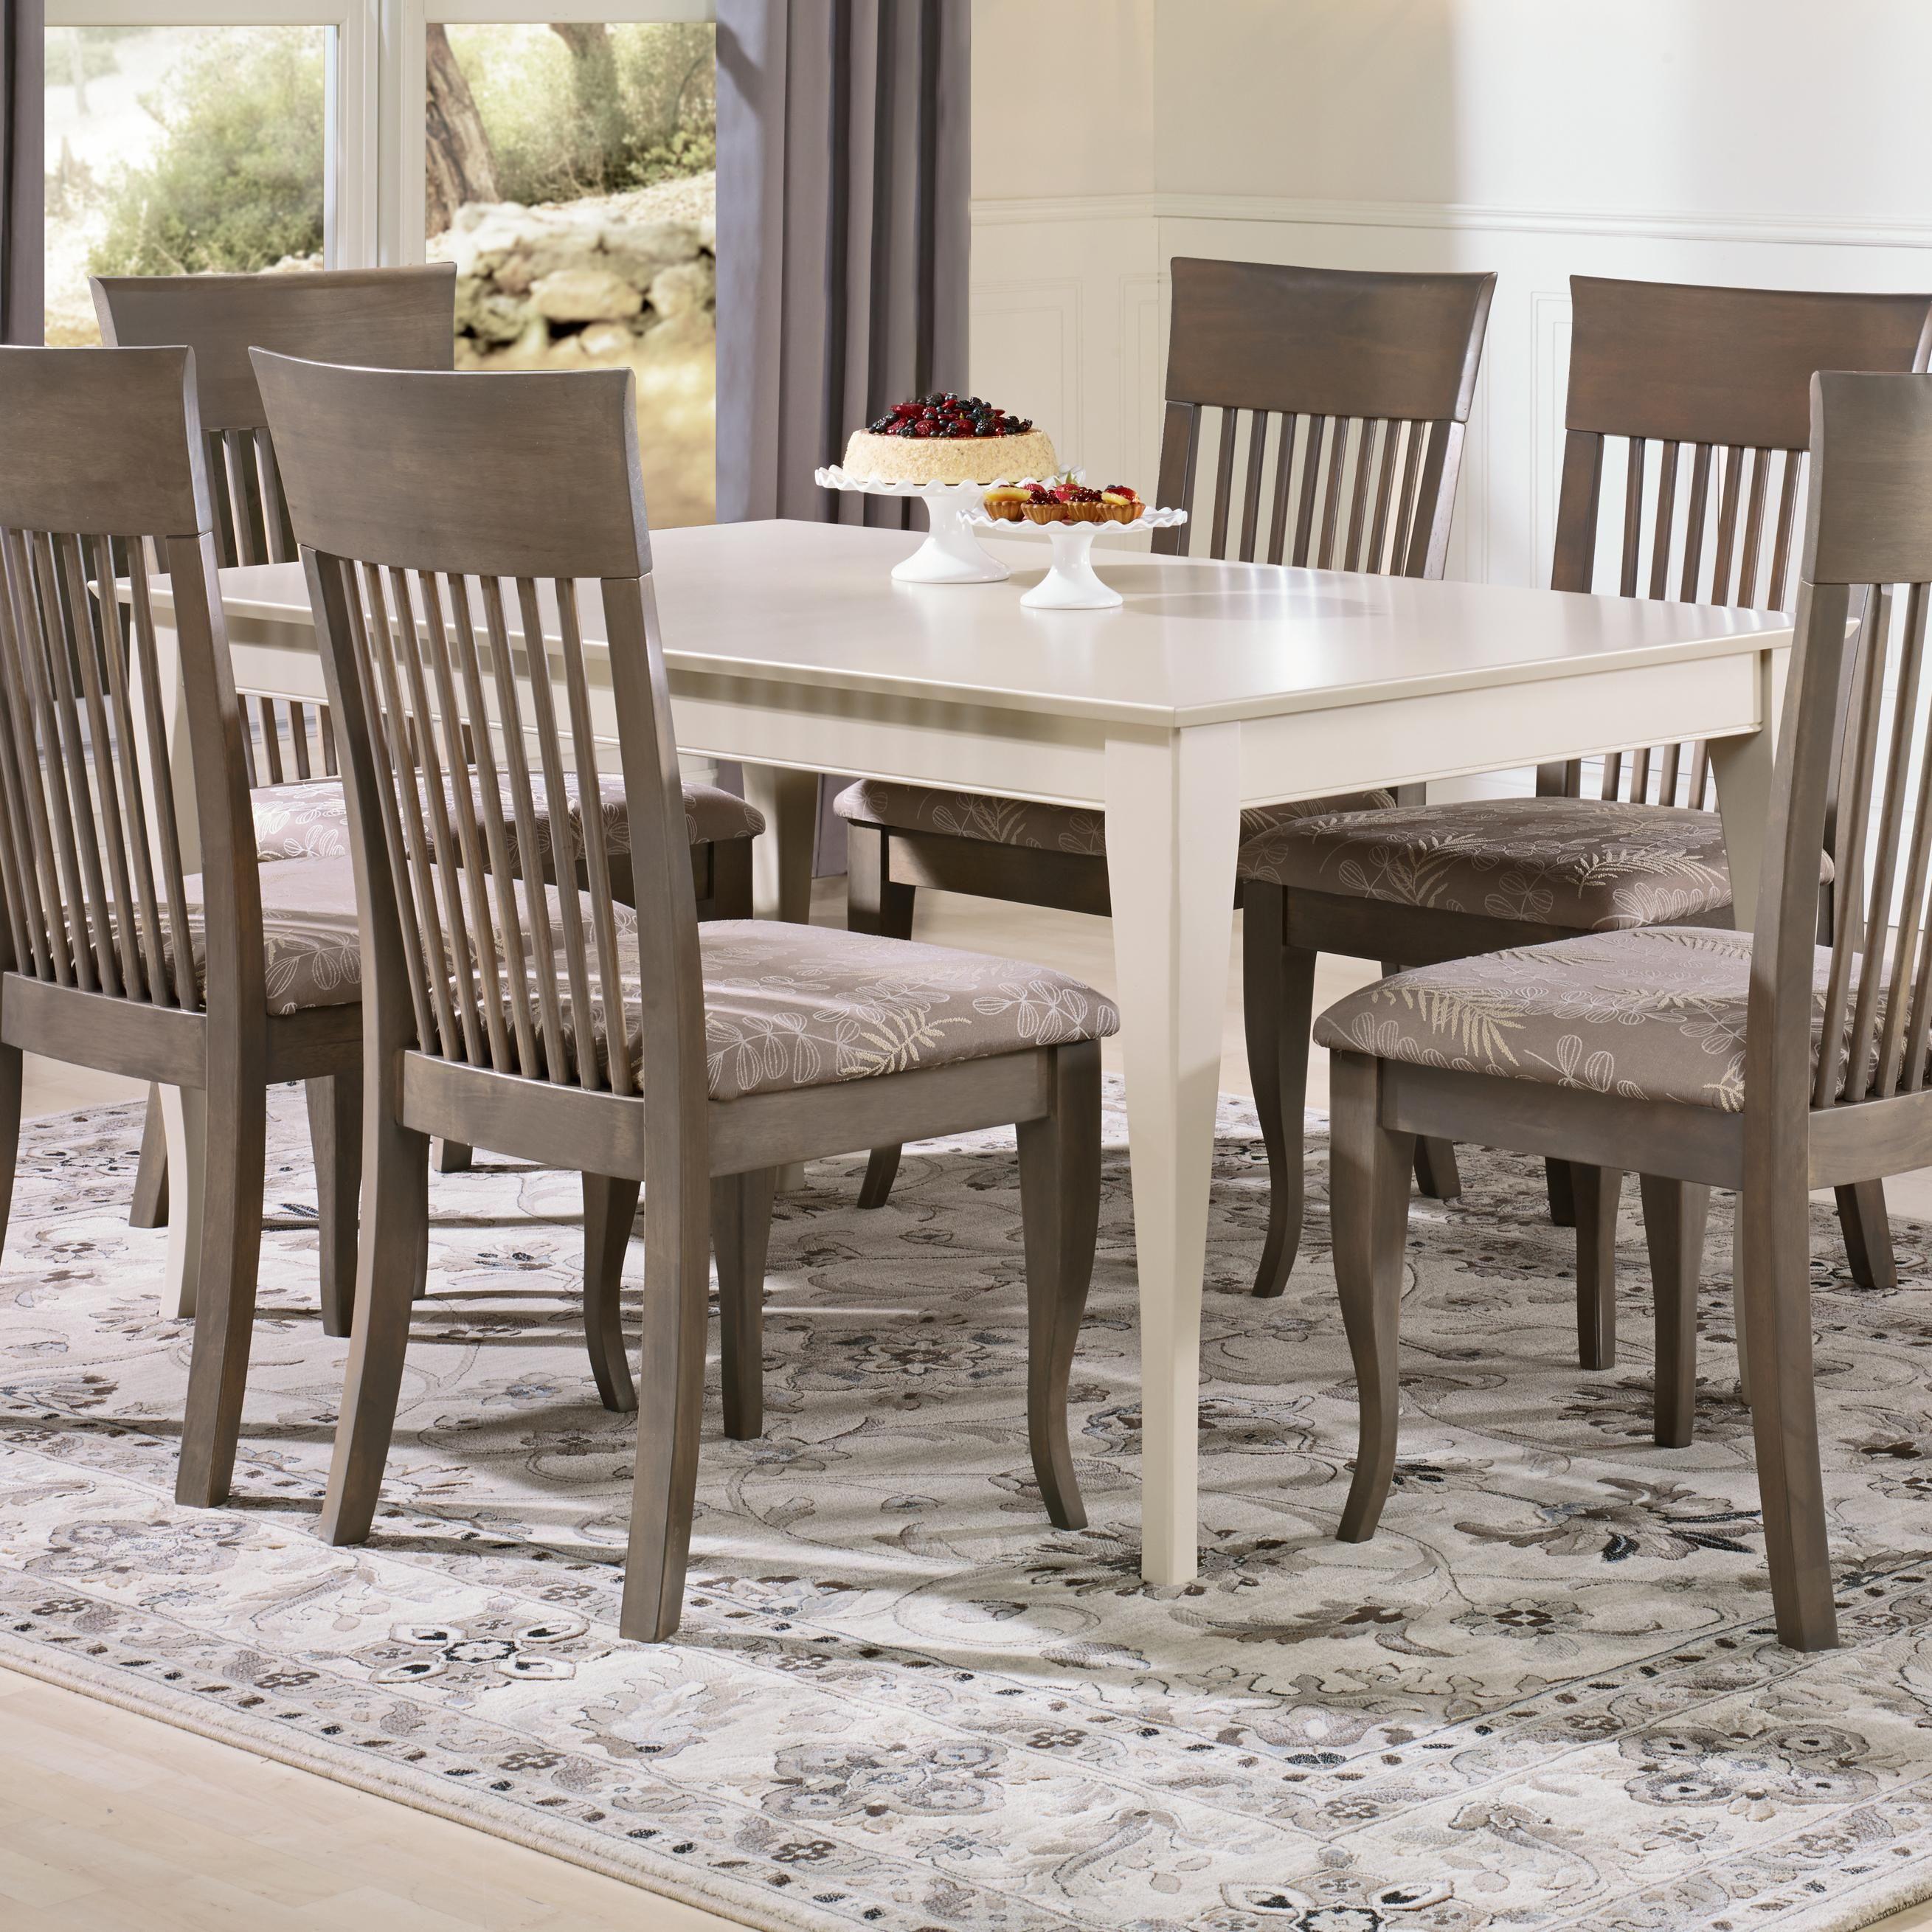 Gourmet Custom Dining Customizable Rectangular Table By Canadel